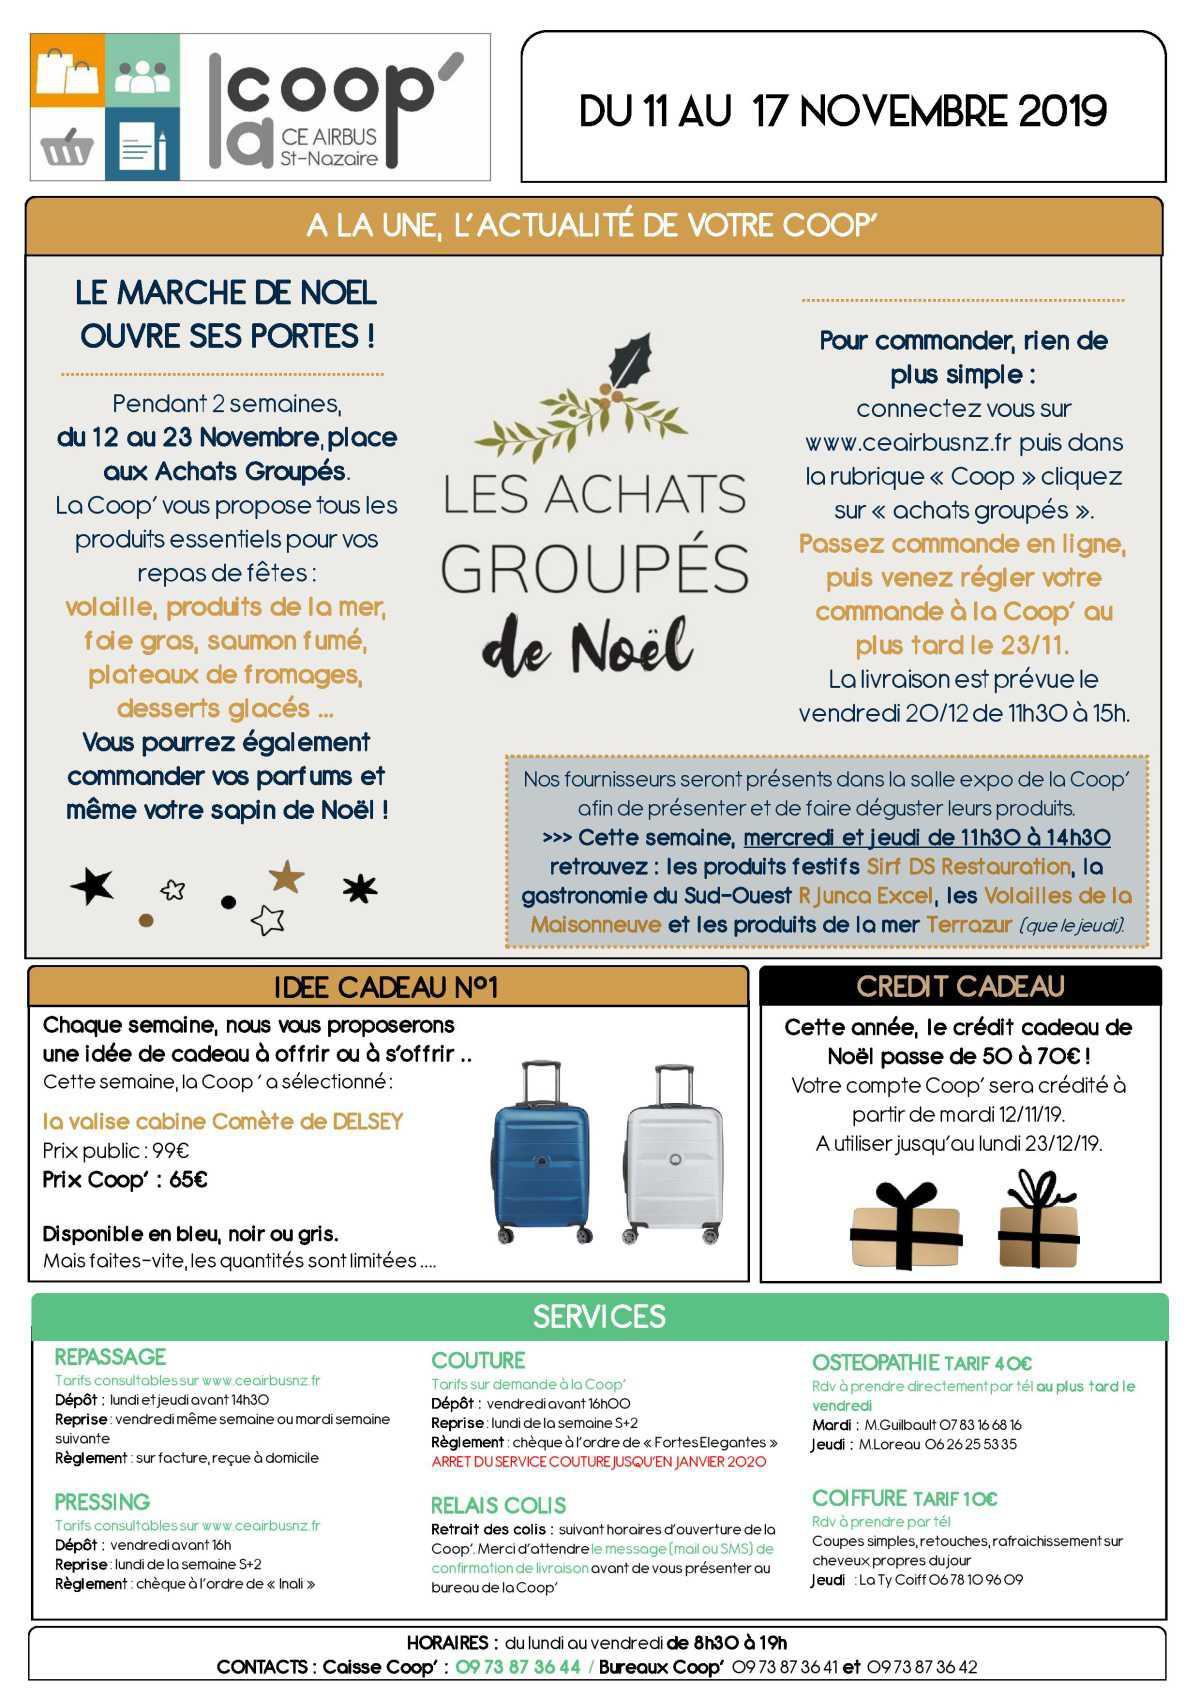 Infos CE / COOP semaine 46